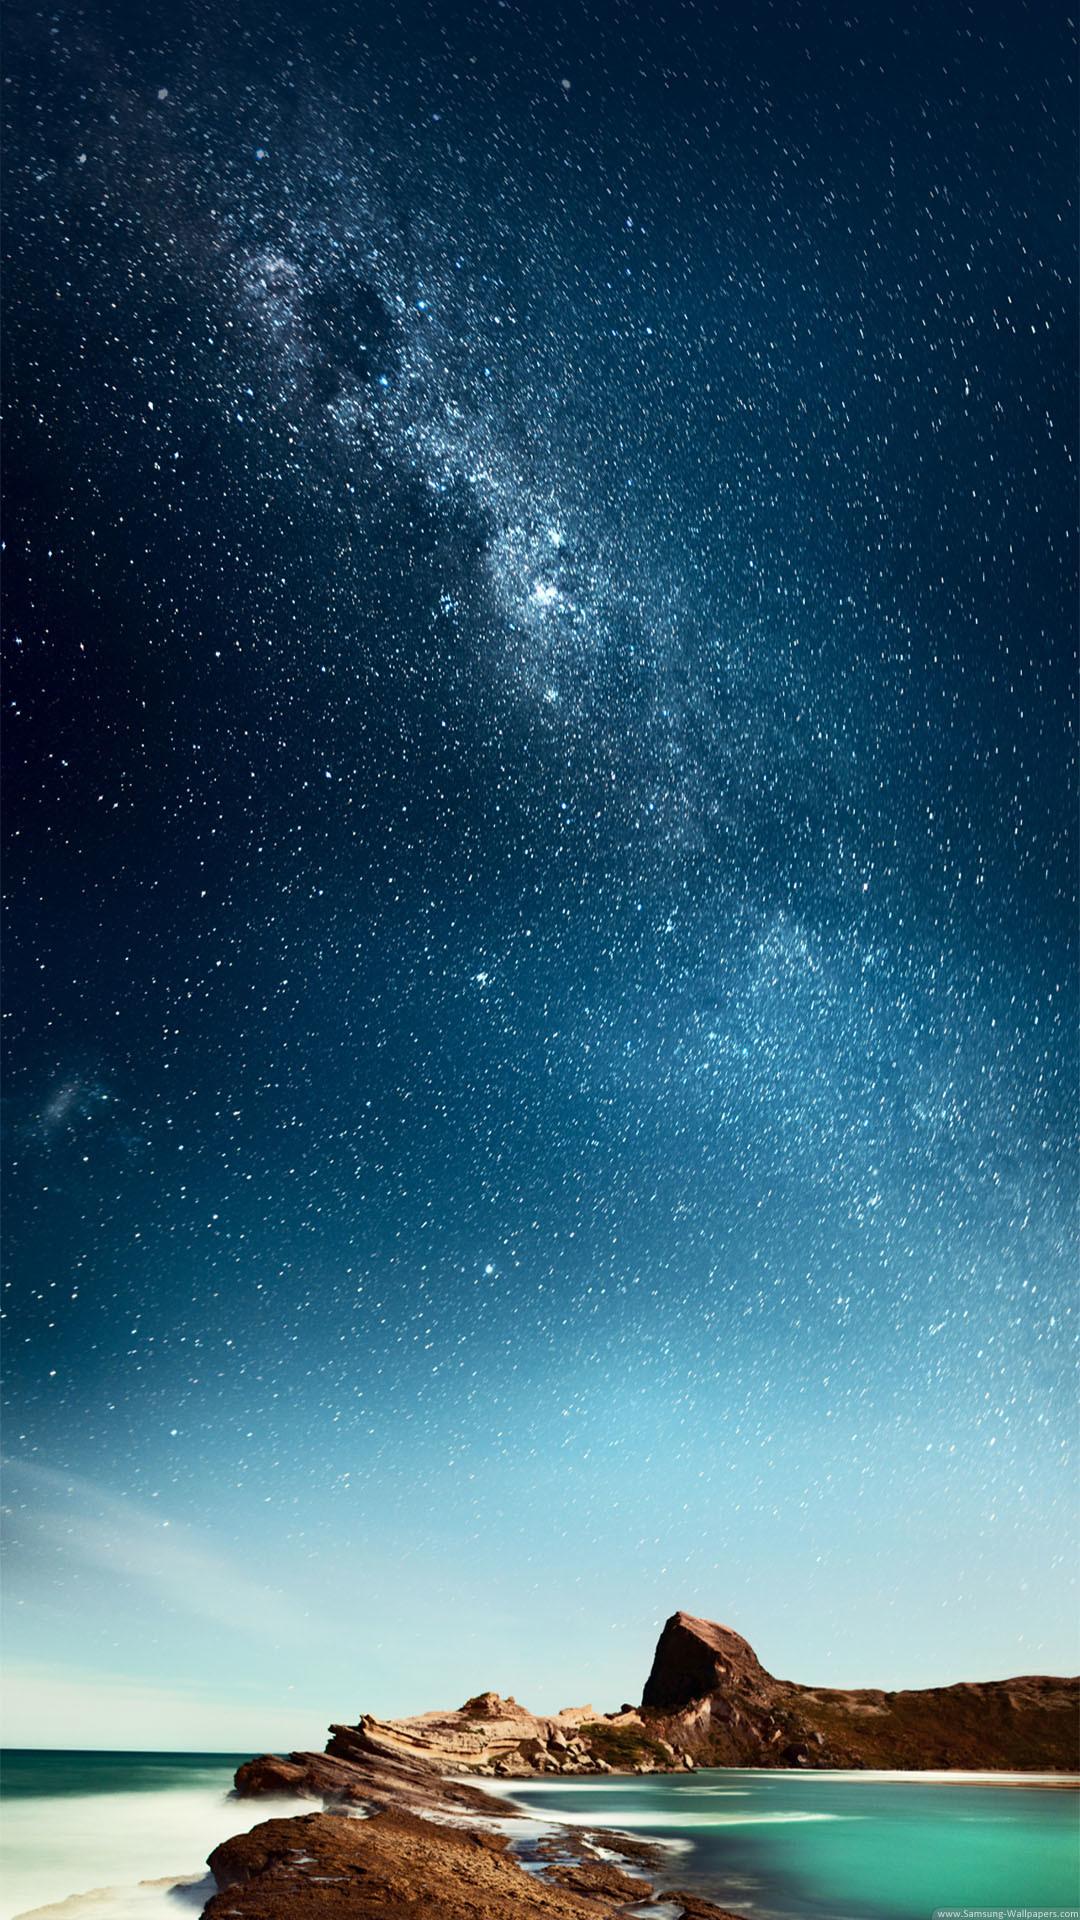 Galaxy Iphone 6 Wallpaper Posted By John Peltier